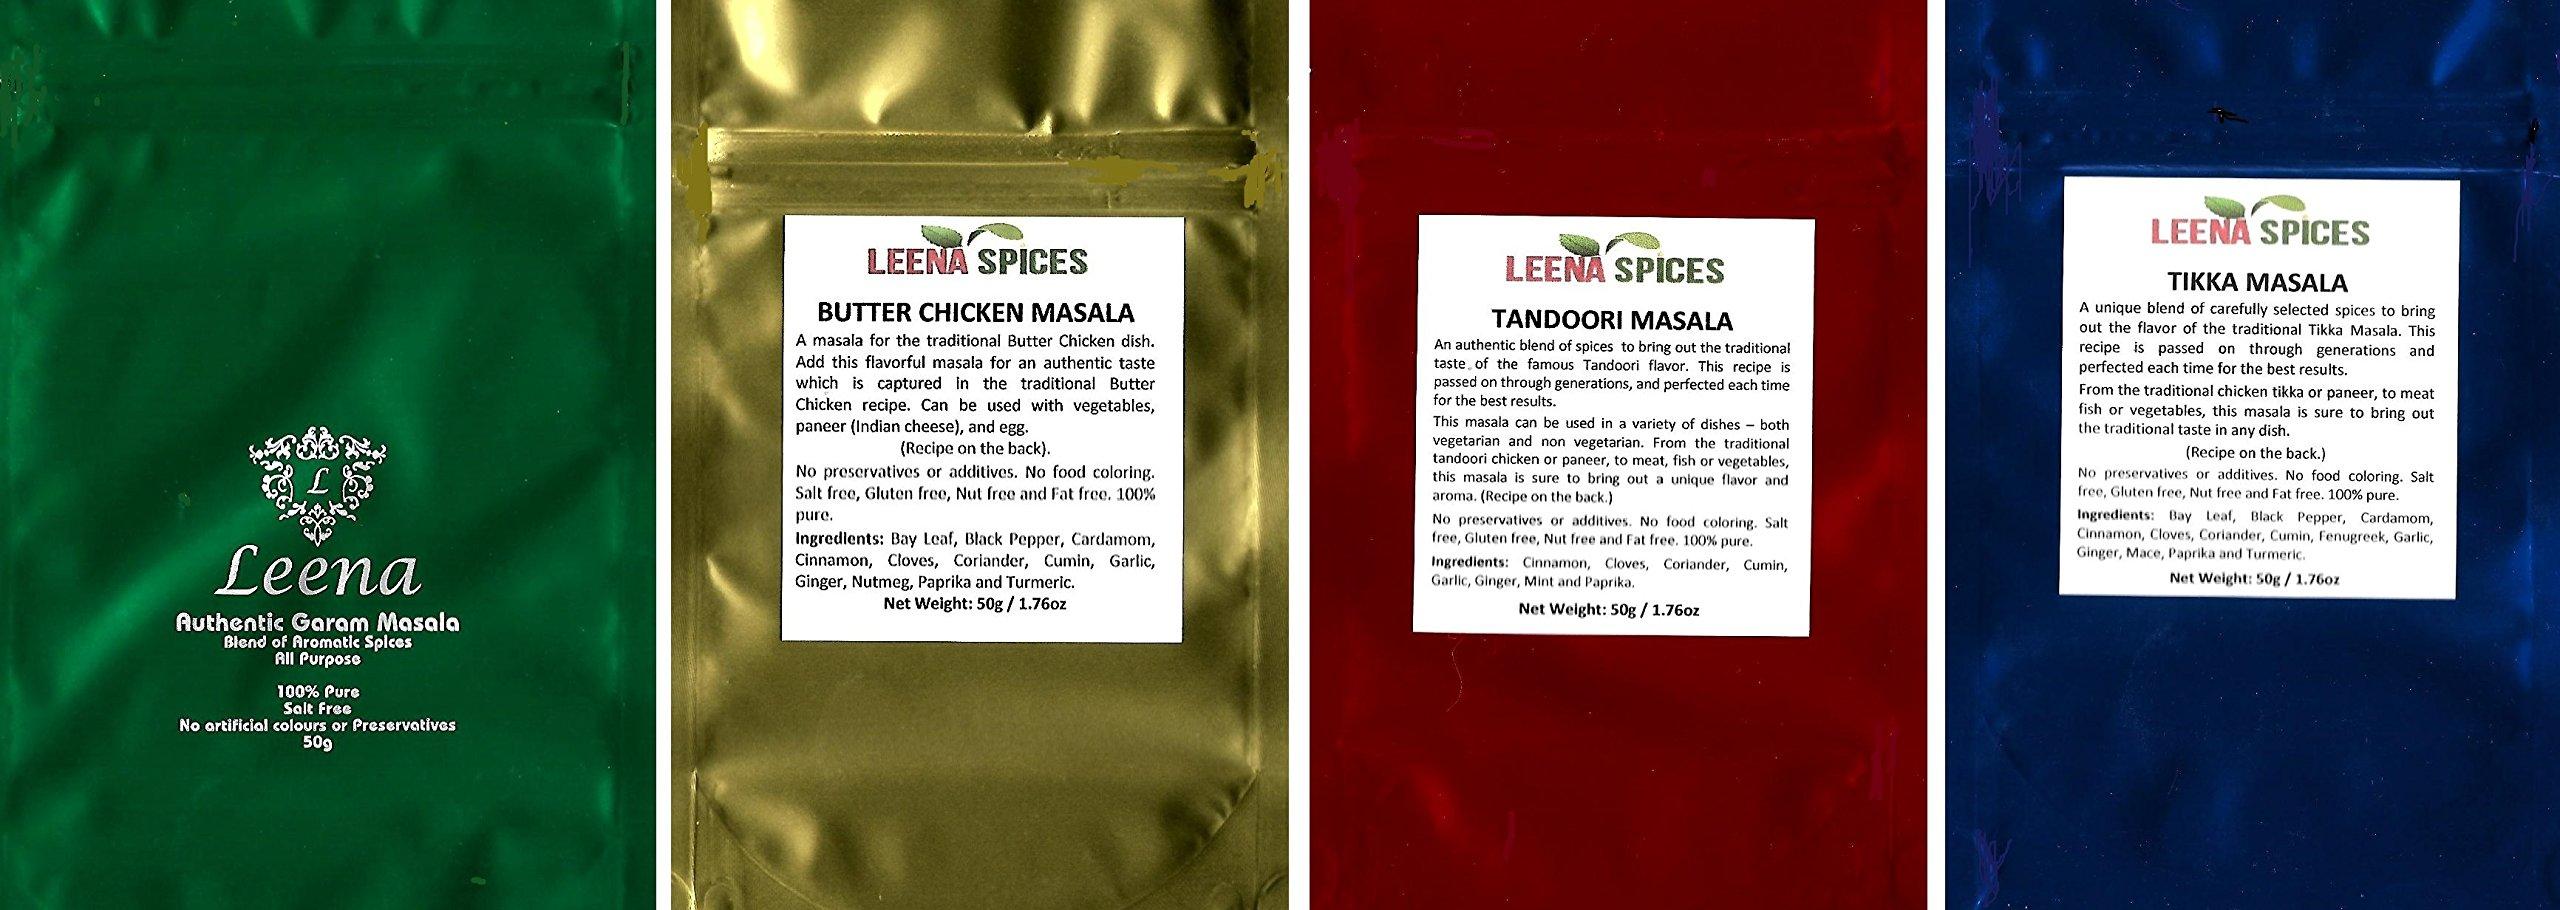 LEENA SPICES - Garam Masala, Butter Chicken Spice, Tandoori Masala Powder Seasoning And Tikka Marinade Blend Rub - 4 Indian Spice Pack